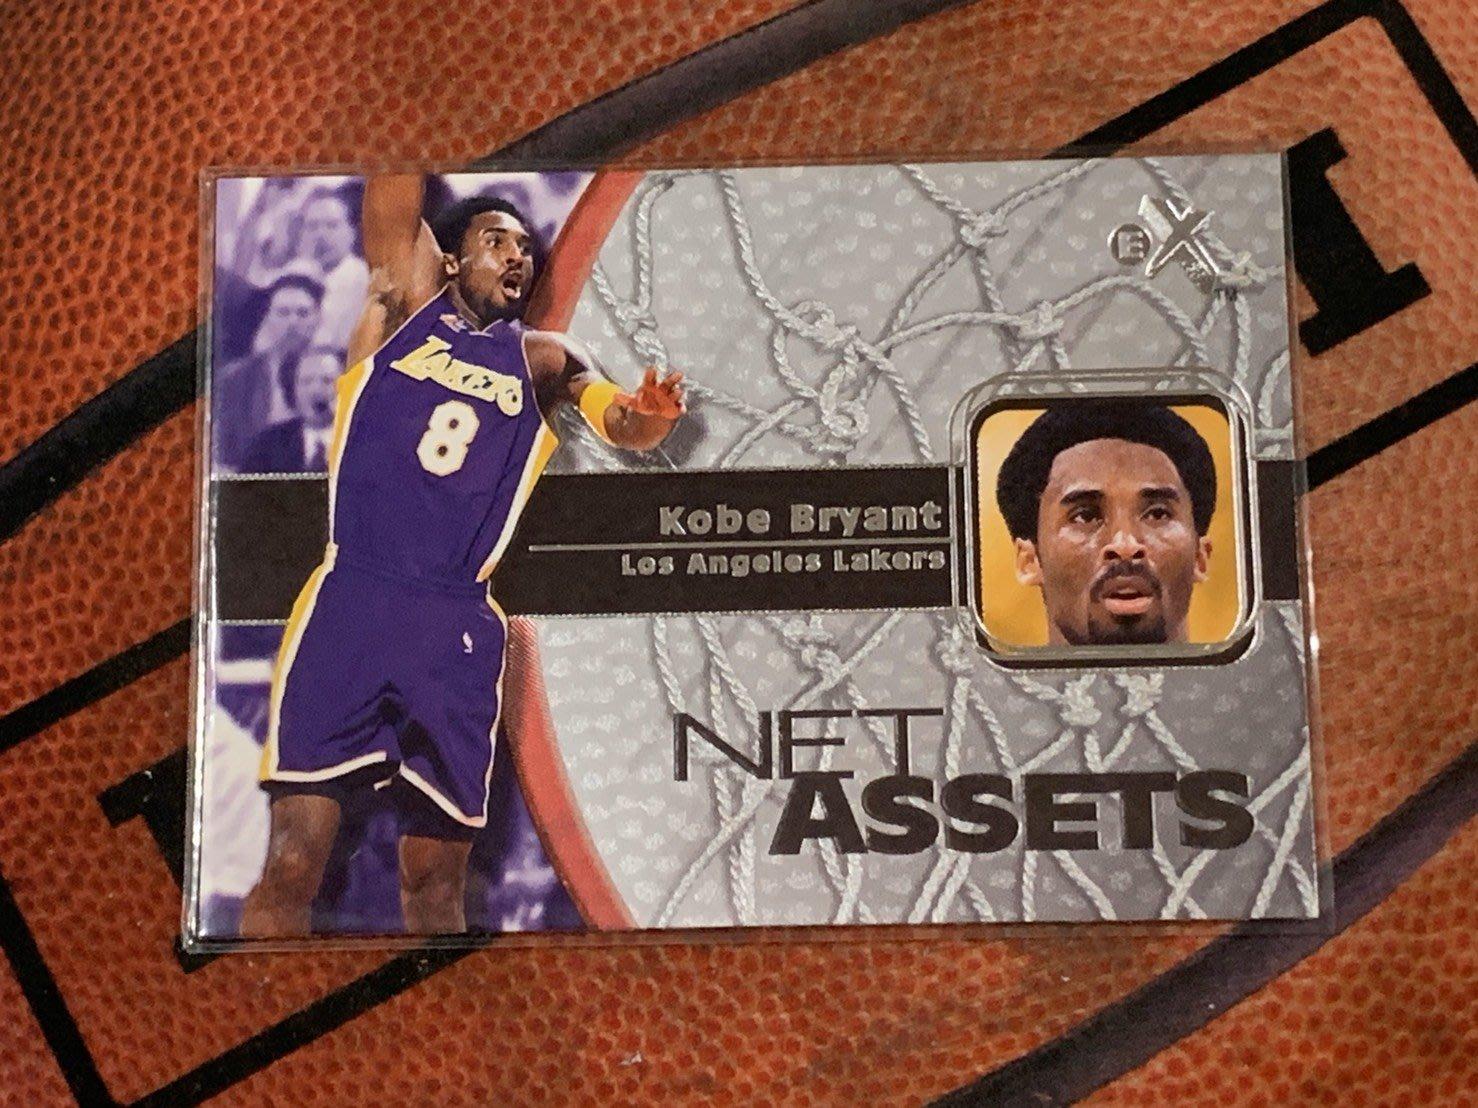 EX  洛杉磯湖人隊 Kobe Bryant 球員卡